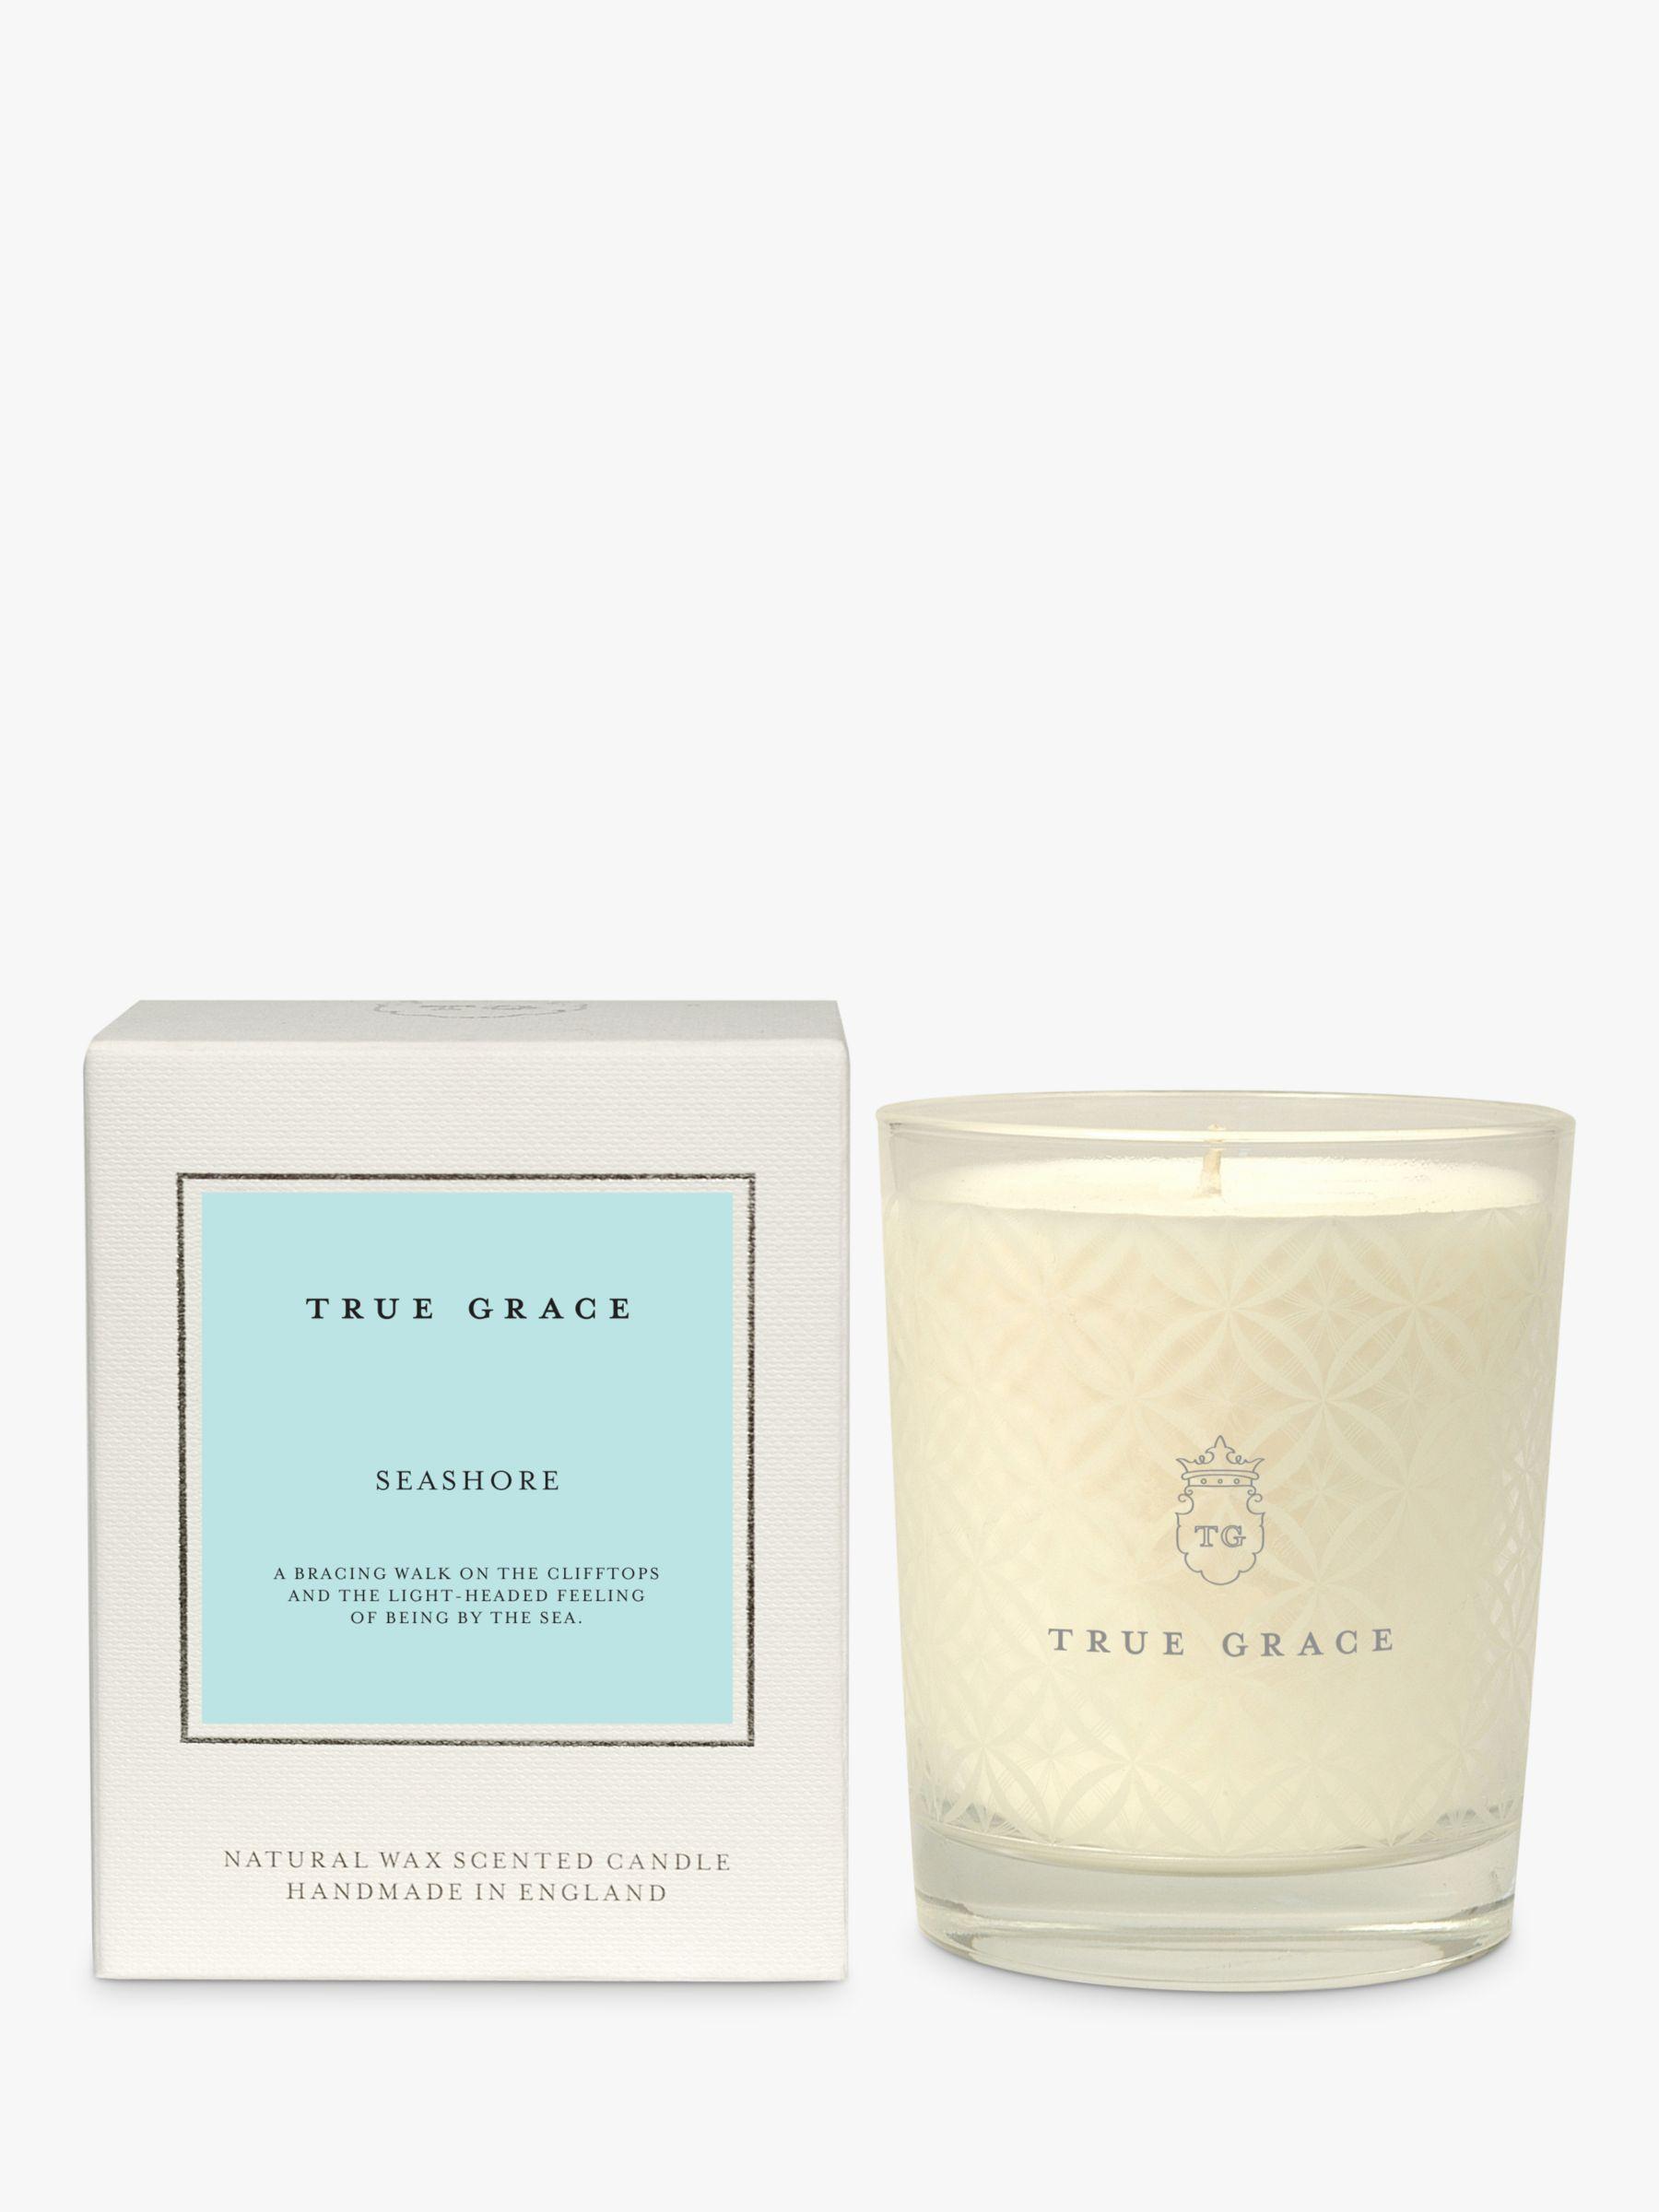 True Grace True Grace Village Seashore Classic Scented Candle